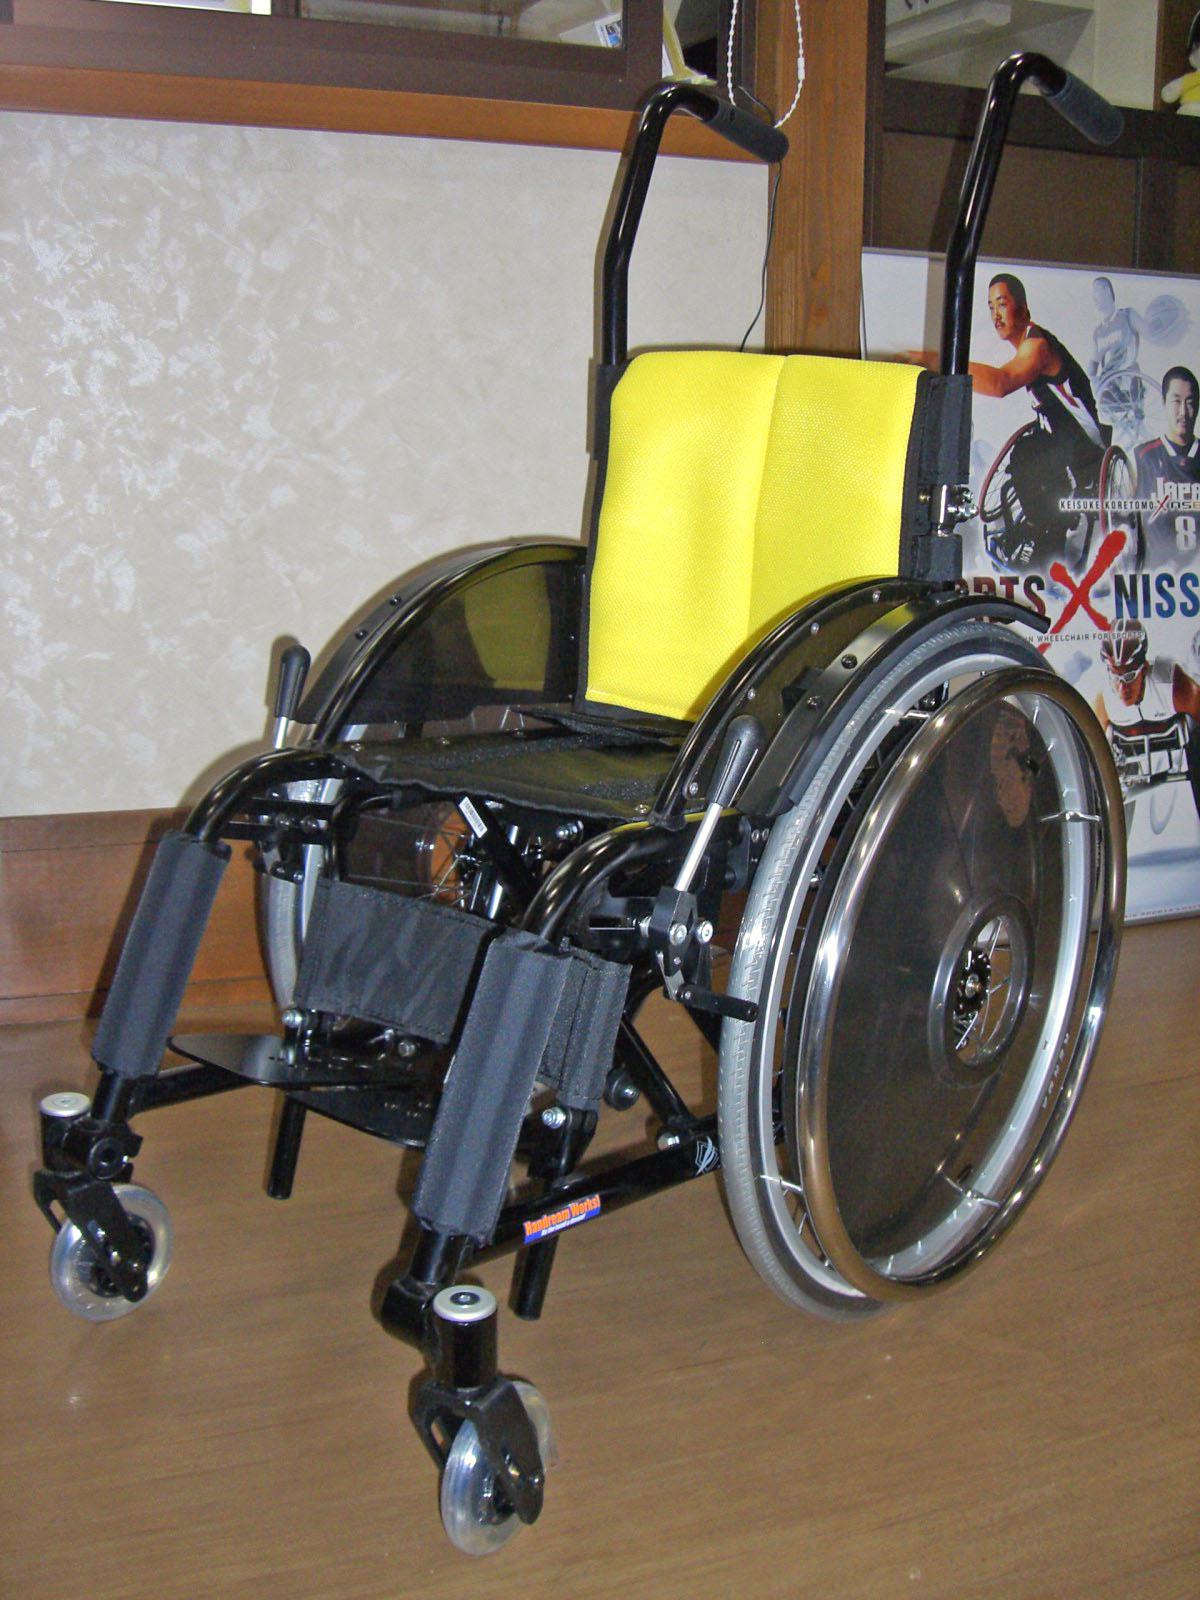 FORCE製NOVA Jr入荷! FORCE製NOVA Jrが入荷しま... 「新鮮出来立て車椅